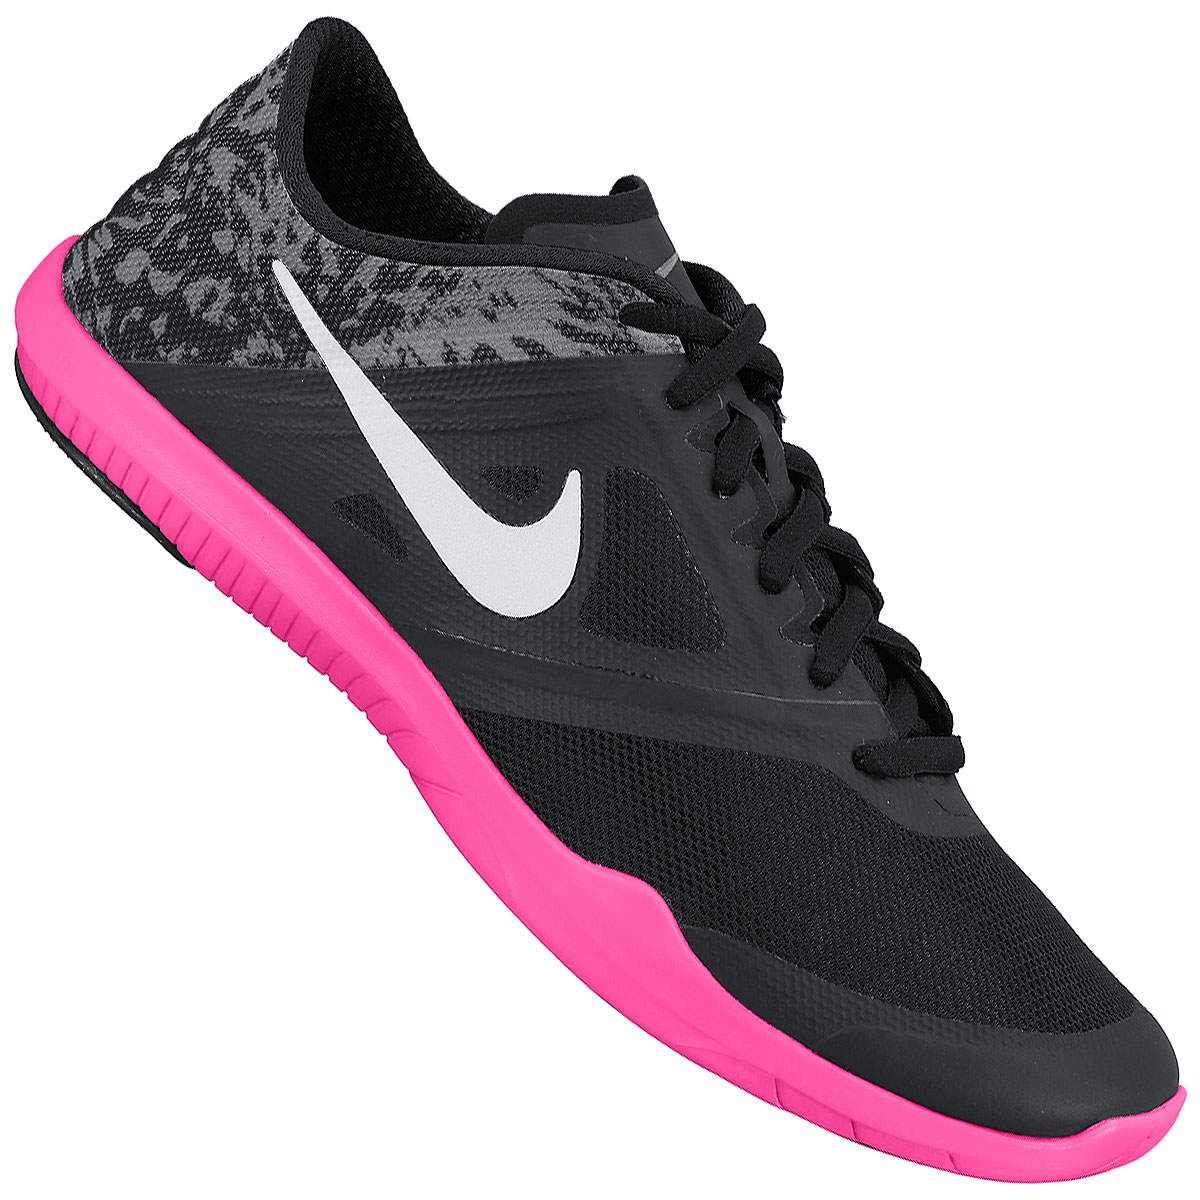 a2e52a1715 Nike Studio Trainer 2 Print